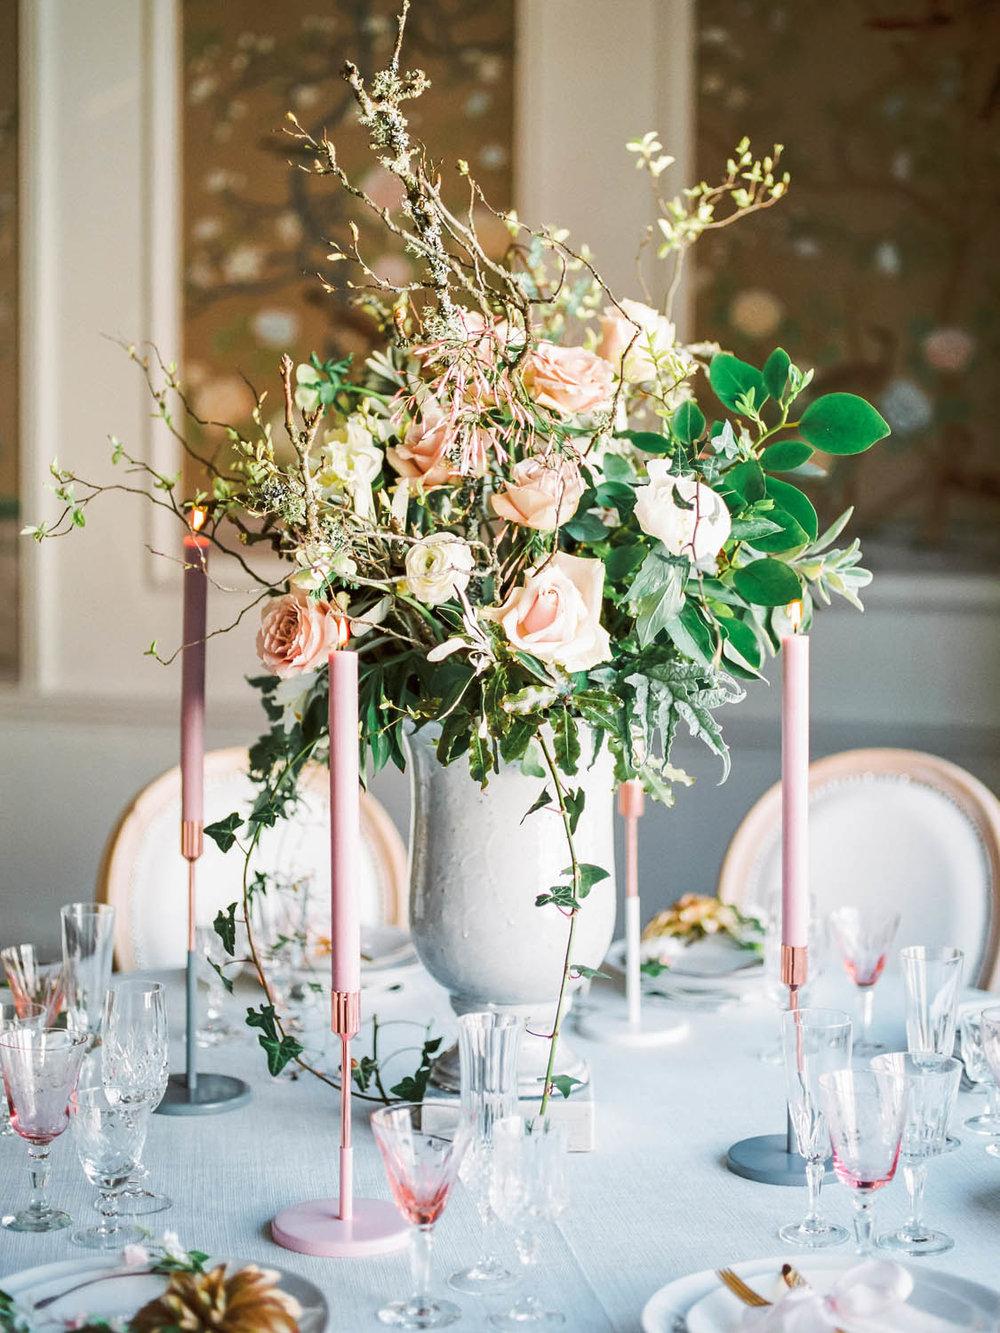 Amy O'Boyle Photography- Destination & UK Fine Art Film Wedding Photographer- The George In Rye Wedding-10.jpg